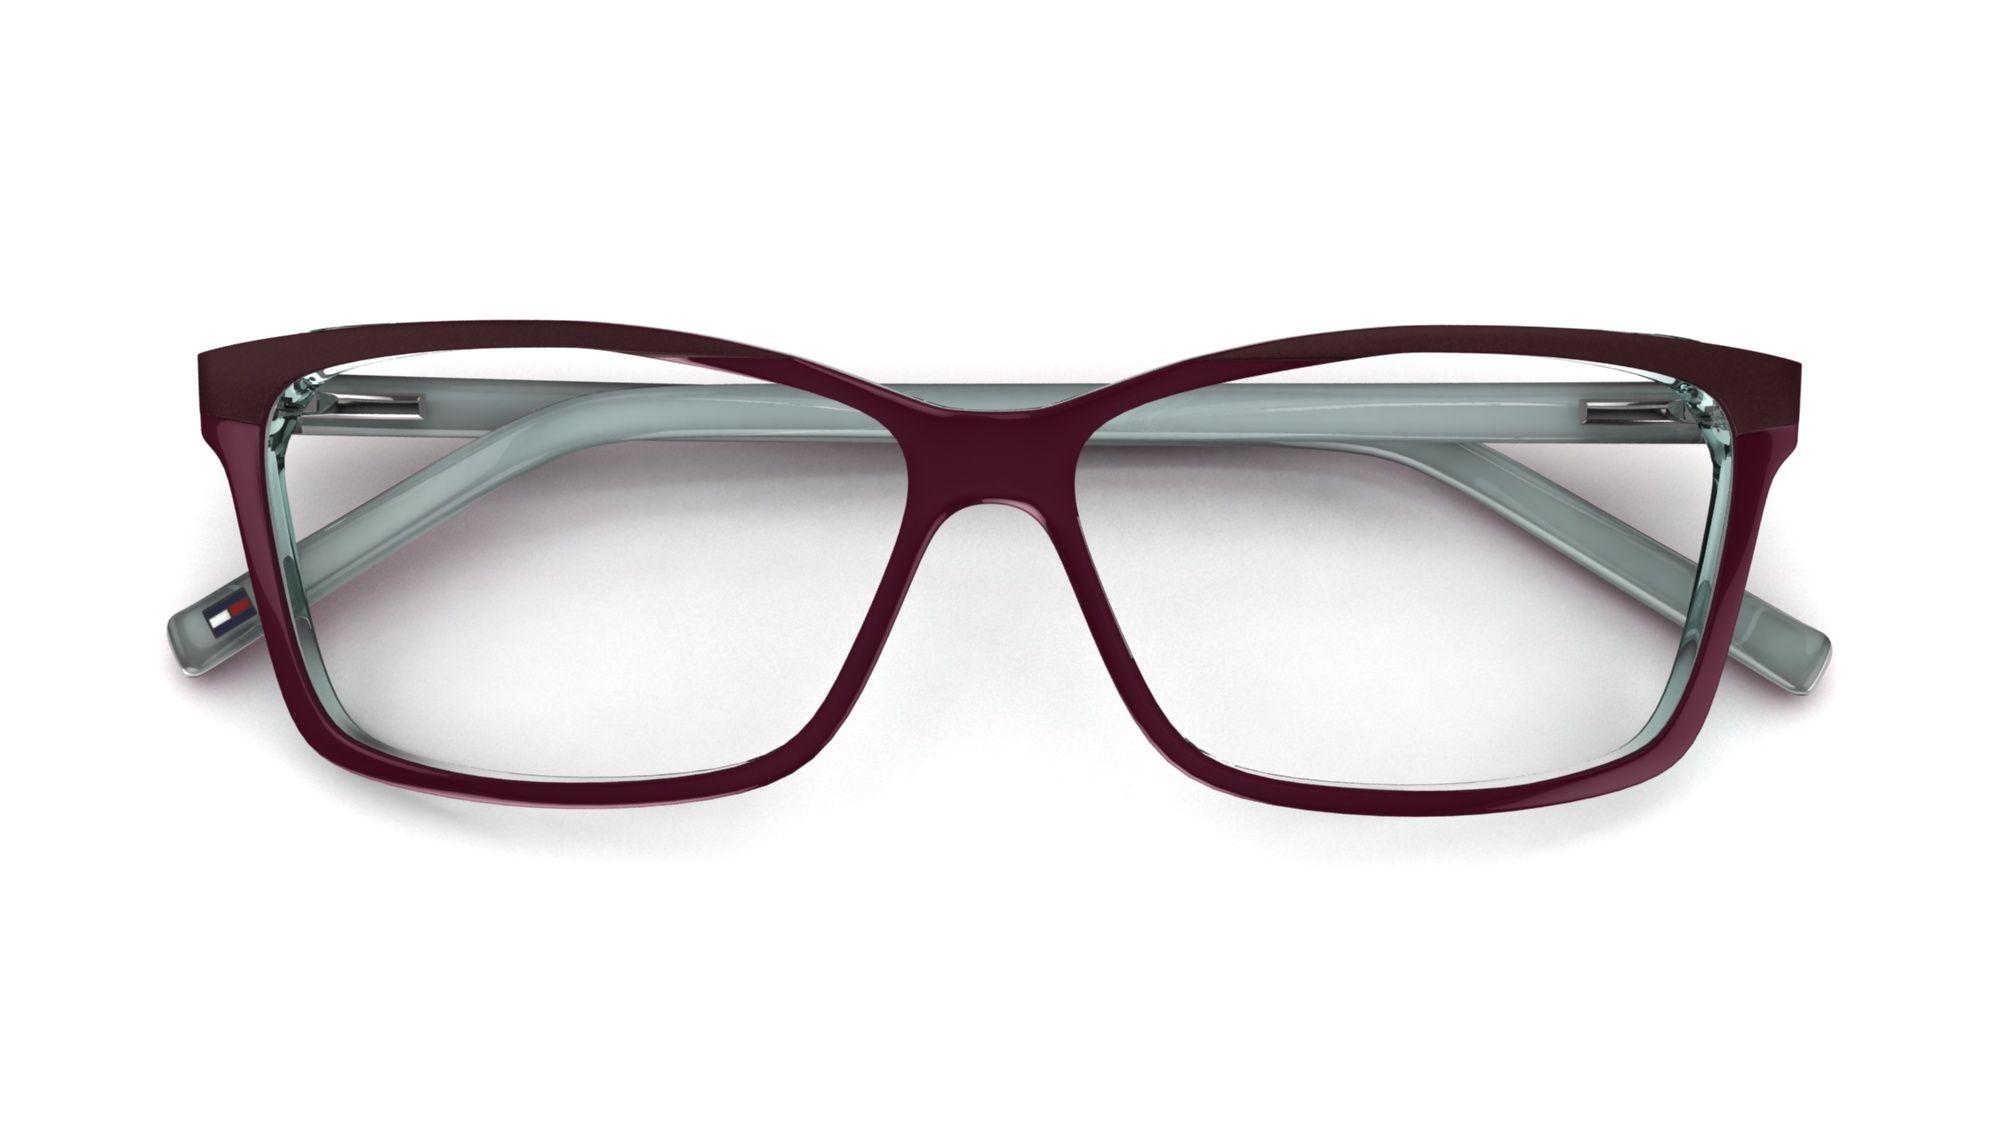 Tommy Hilfiger glasses - TH 55 | Glasses | Pinterest